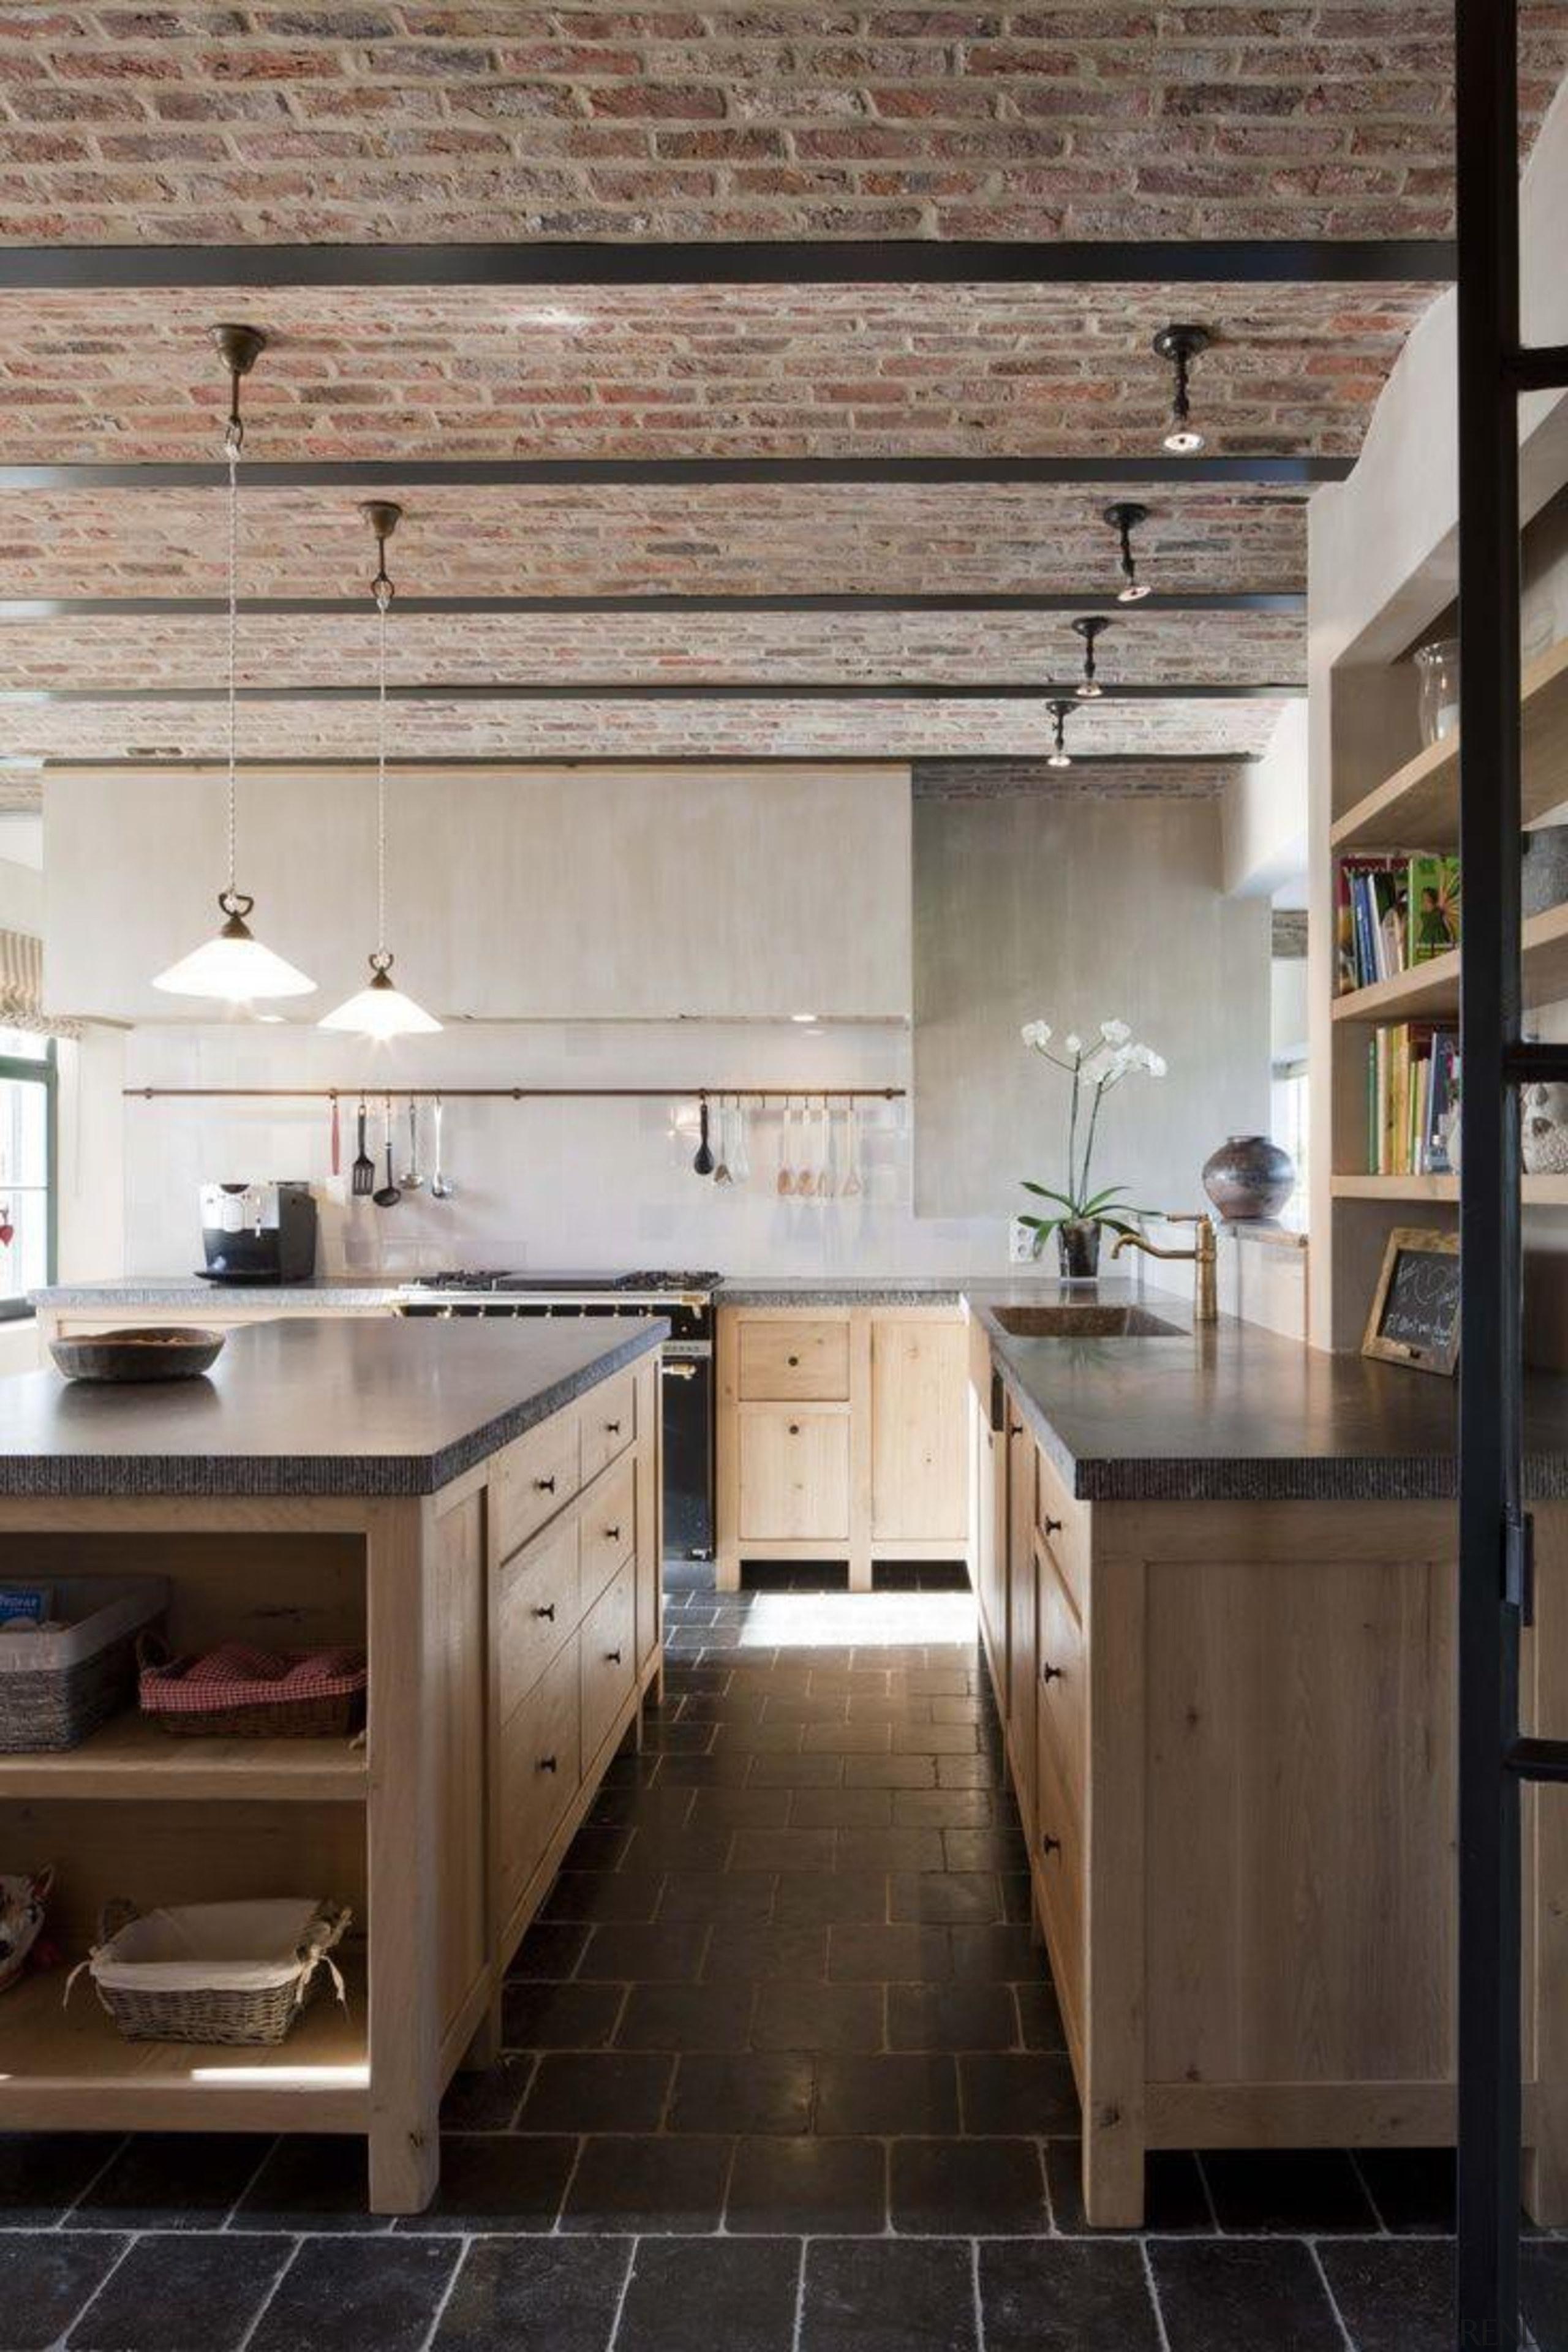 Start a myTrends ProjectCreate an ideas hub for cabinetry, countertop, cuisine classique, floor, flooring, hardwood, interior design, kitchen, wood flooring, gray, black